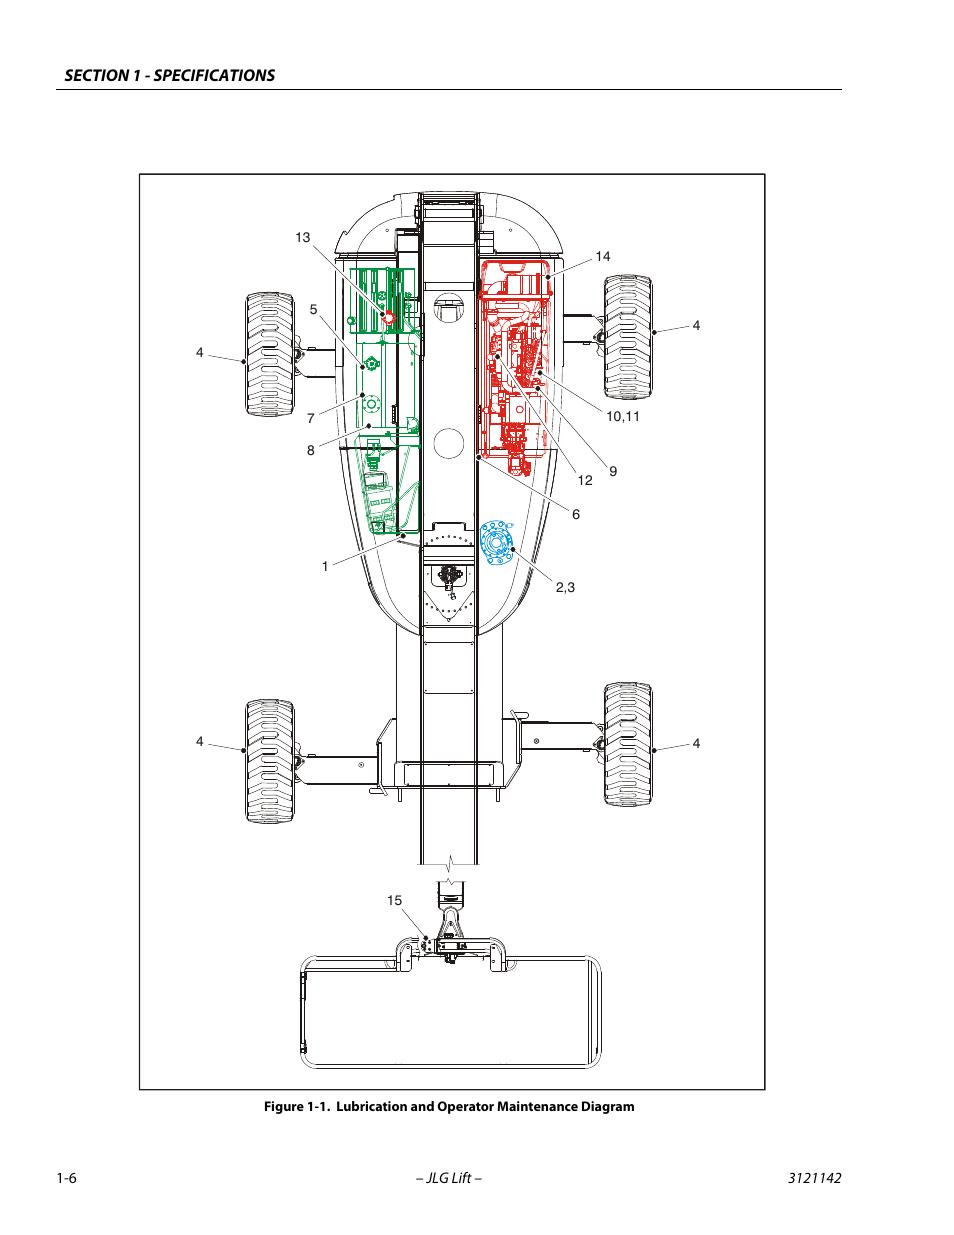 Lubrication And Operator Maintenance Diagram